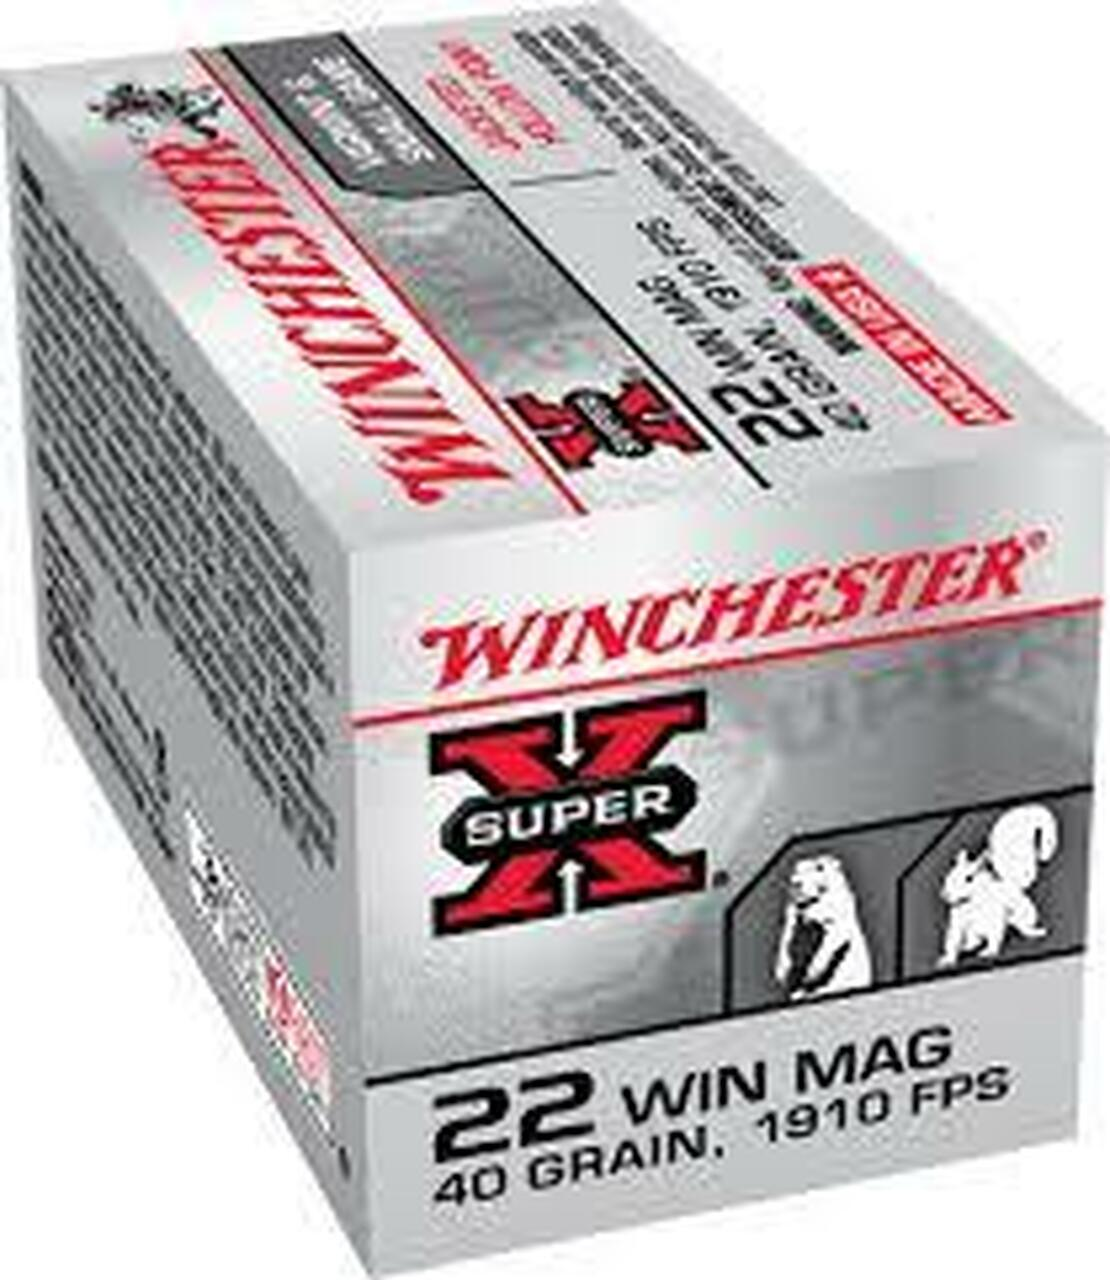 22 WMR Ammo